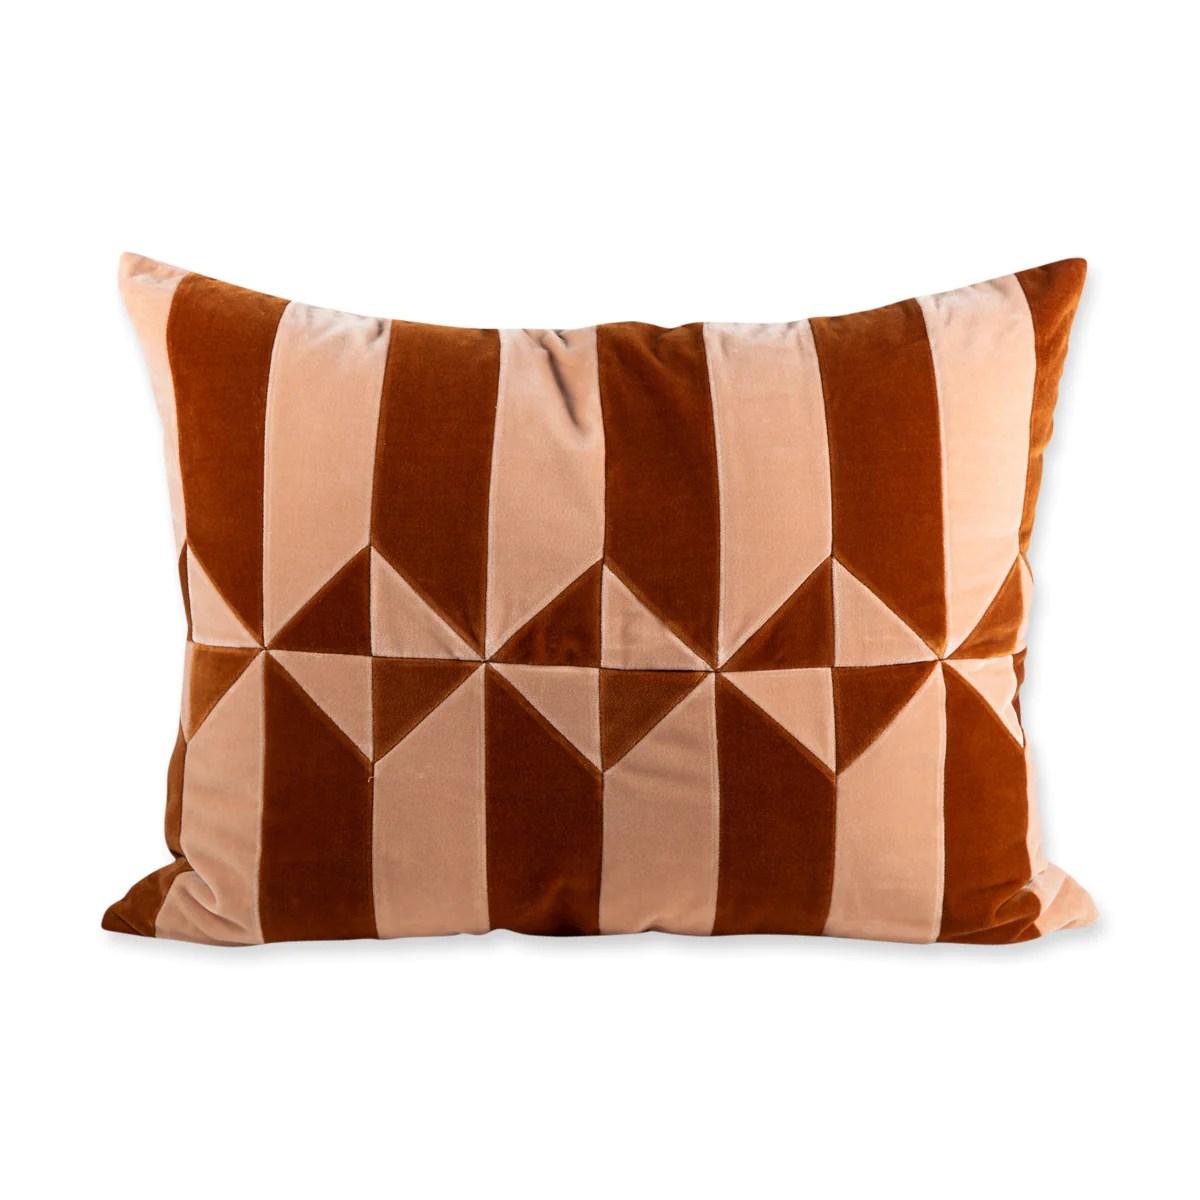 furbish studio hopkins velvet pillow peach burnt orange